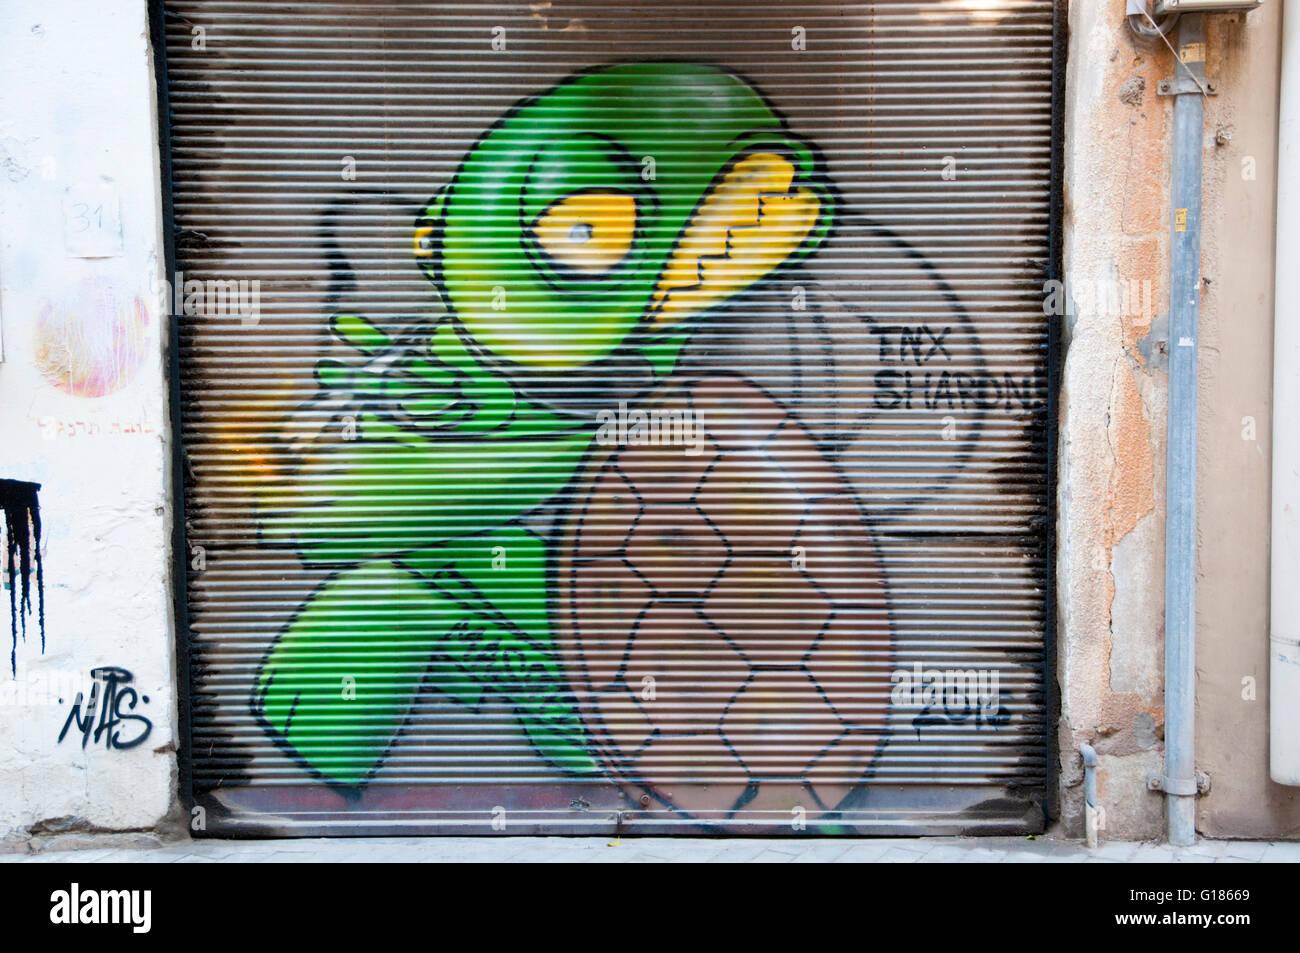 Tortoise with a joint Graffiti wall art in Florentin neighbourhood, Tel Aviv - Stock Image